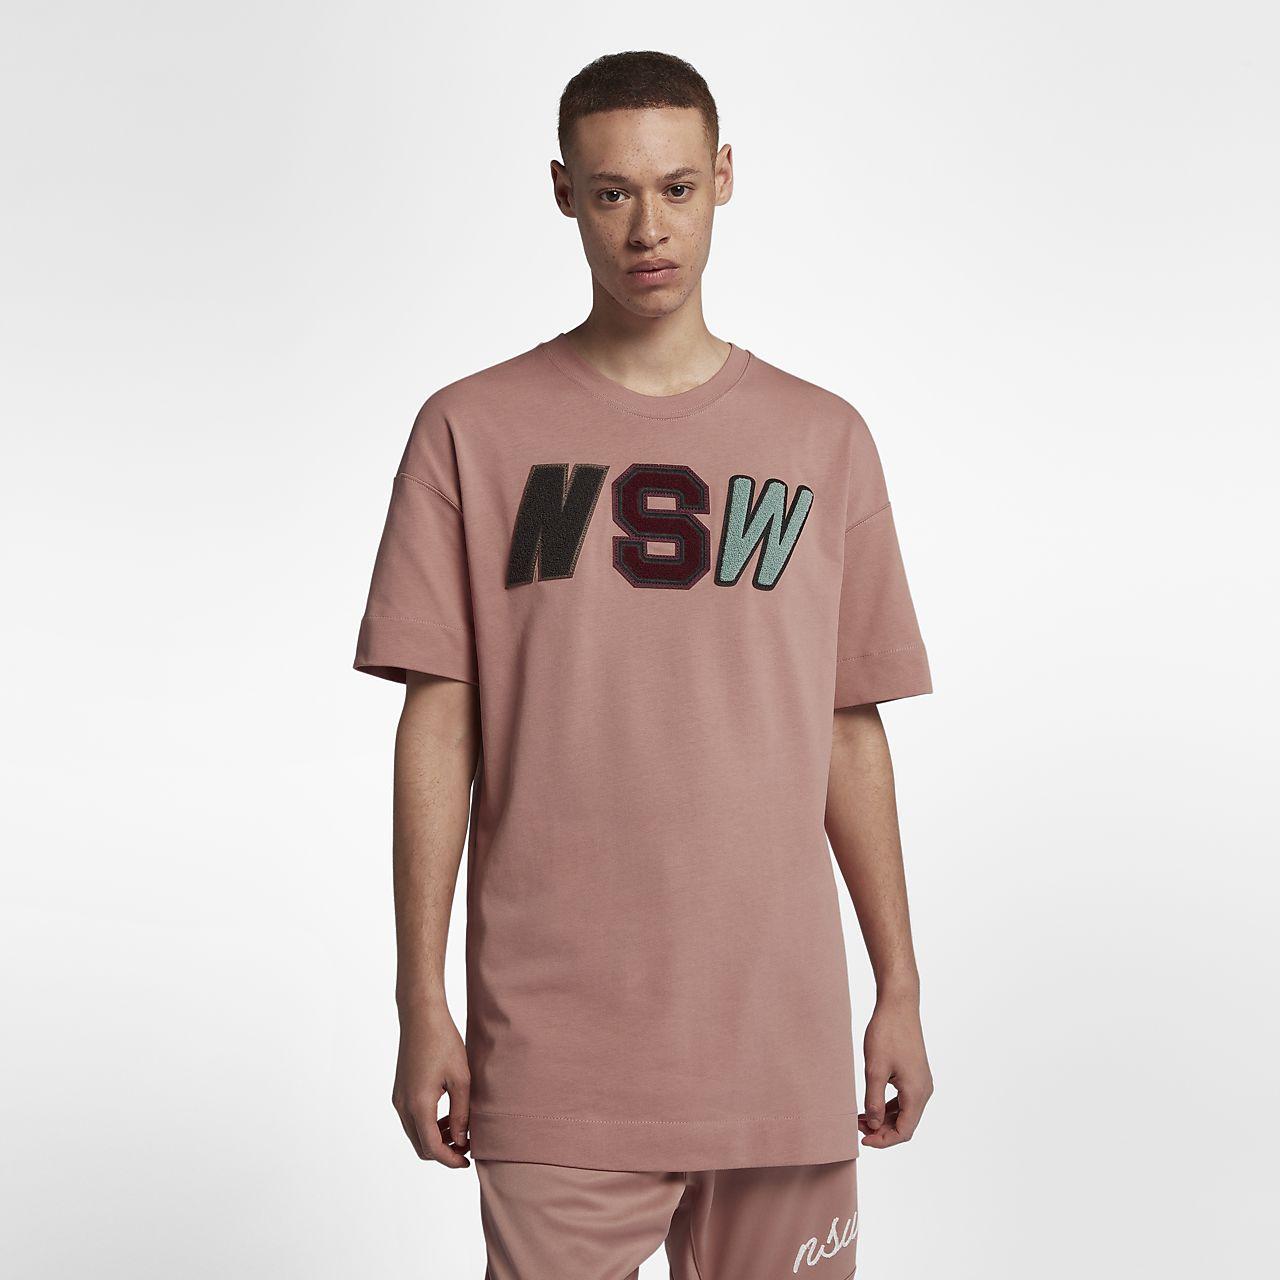 Tee-shirt Nike Sportswear NSW pour Homme